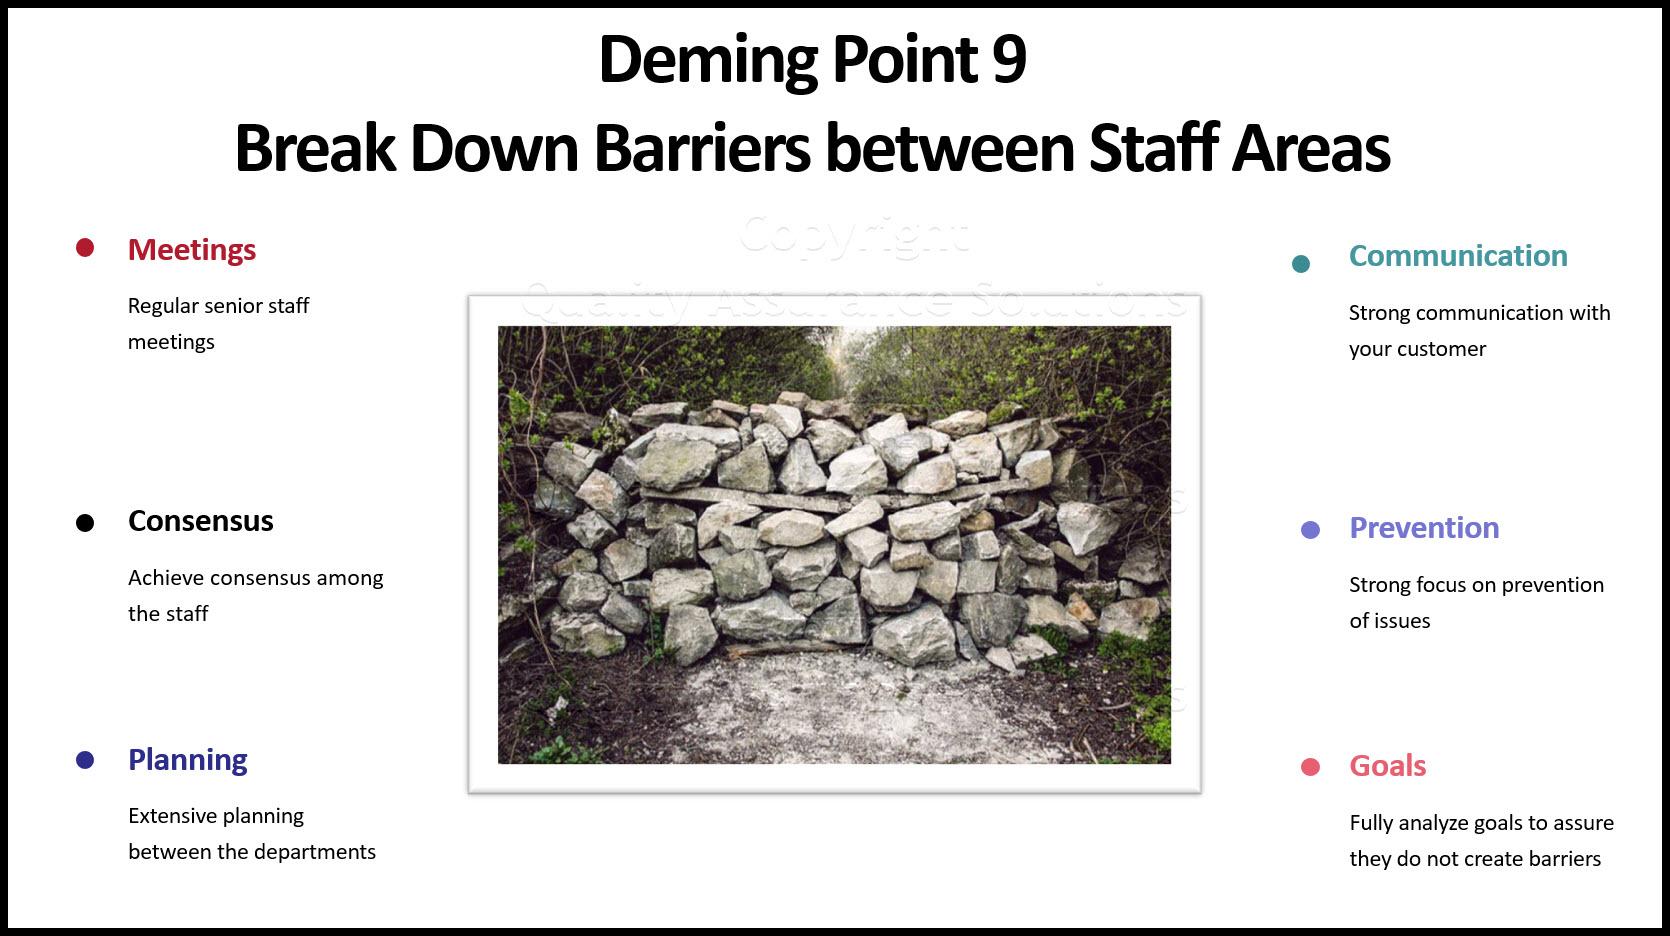 Deming Point 9 business slide